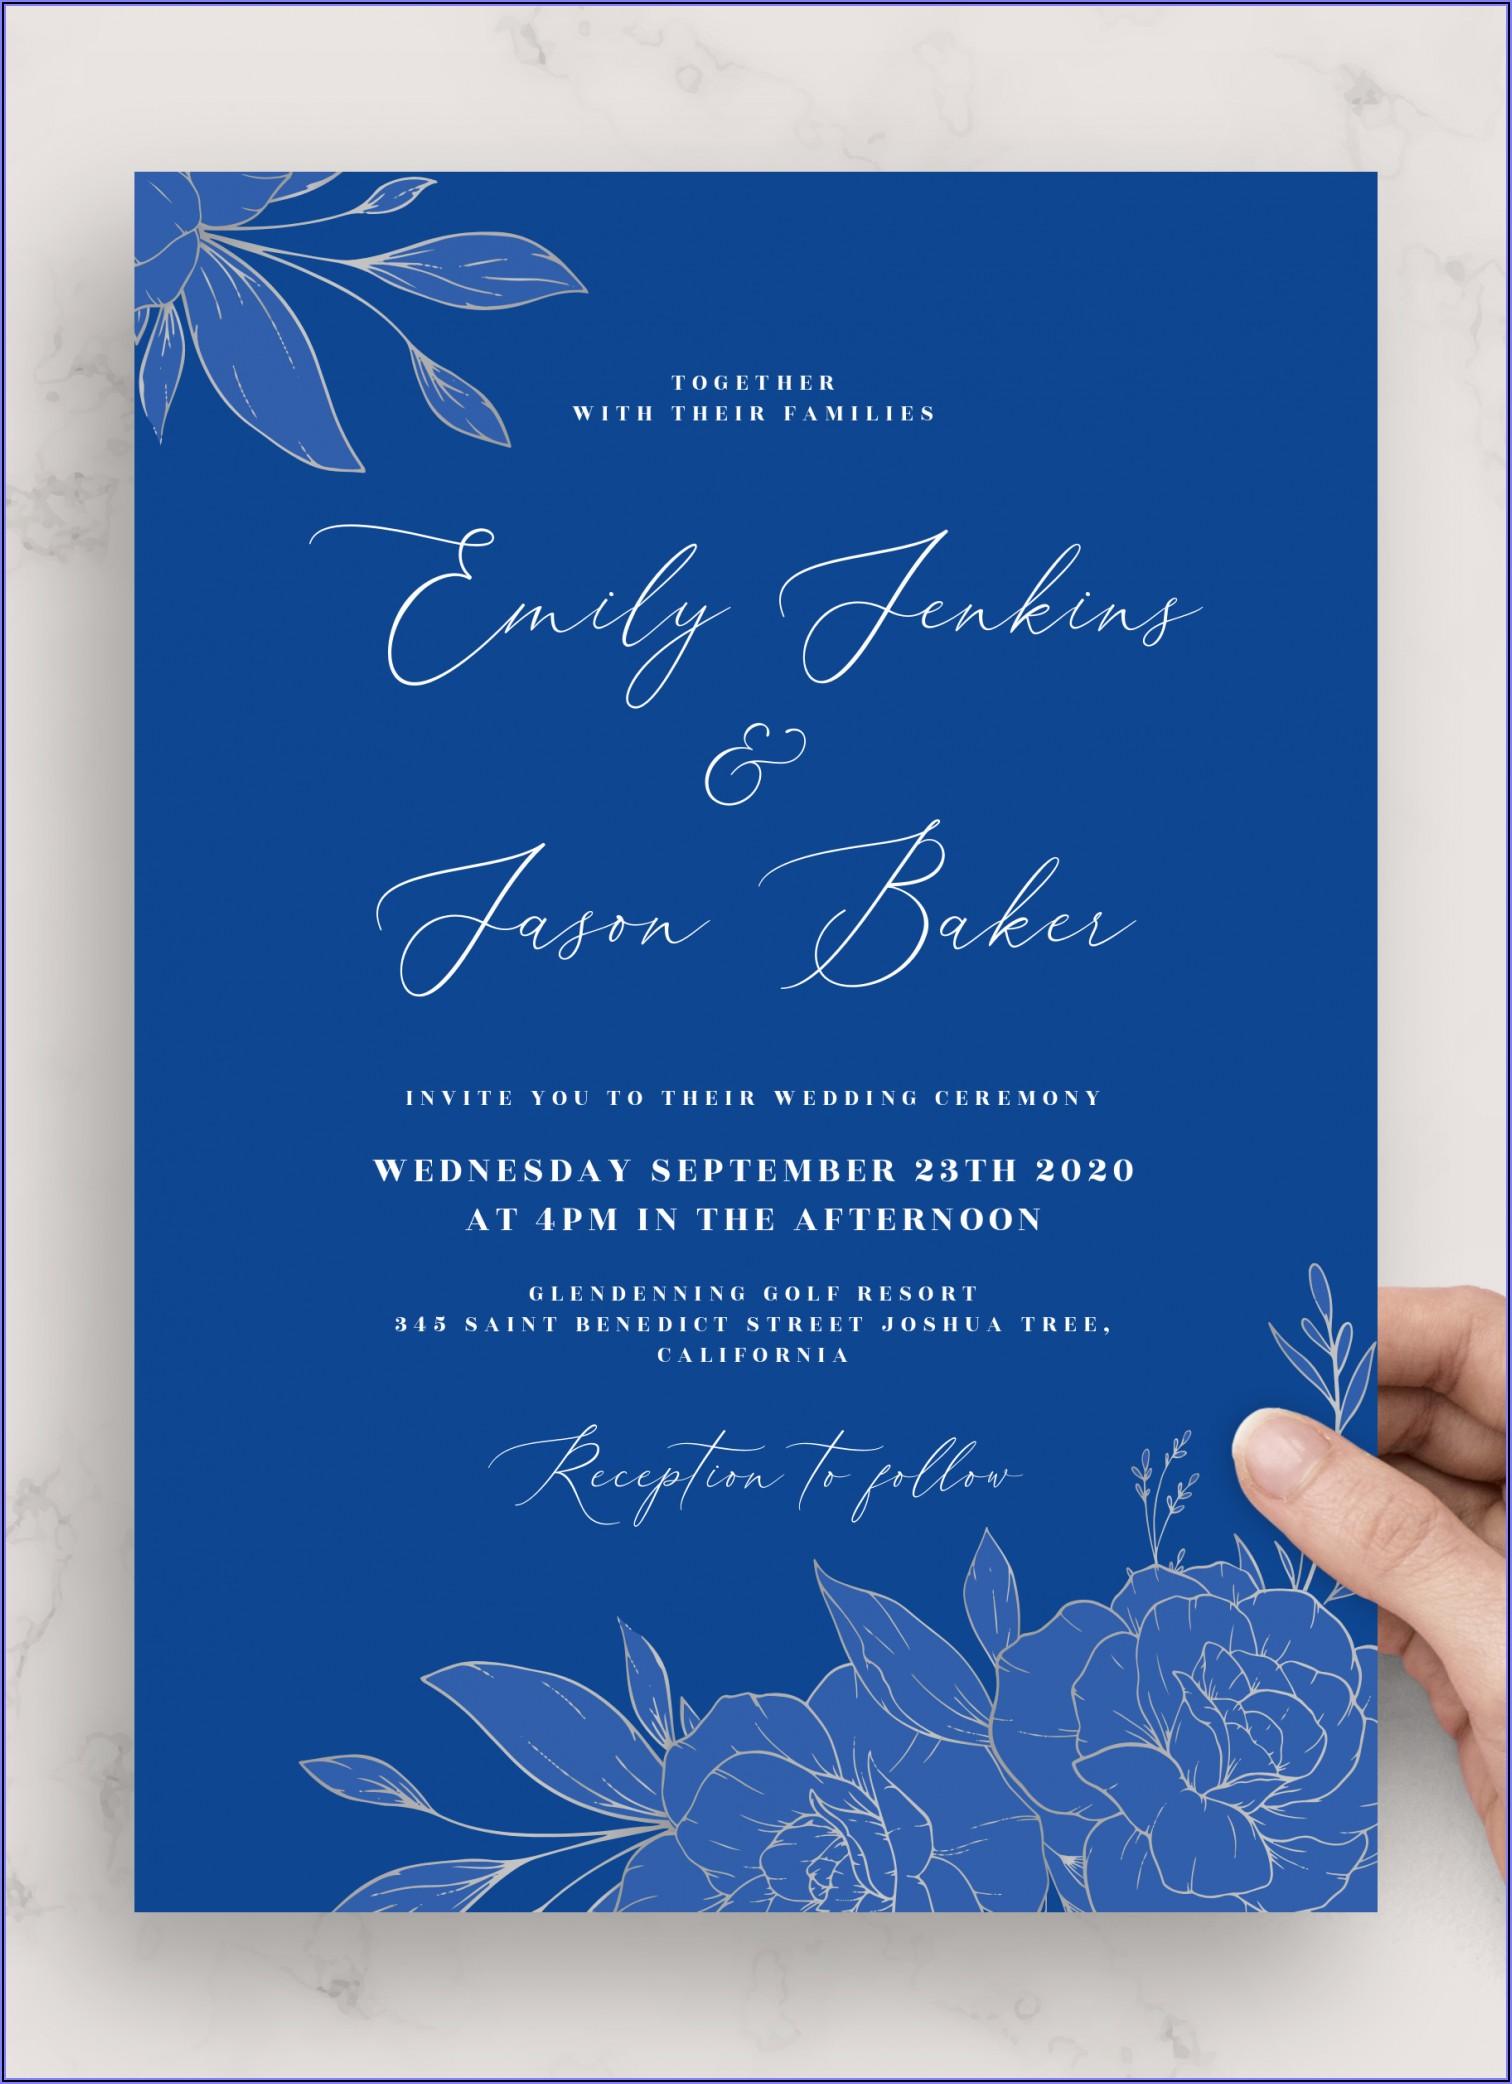 Blue Elegant Wedding Invitation Background